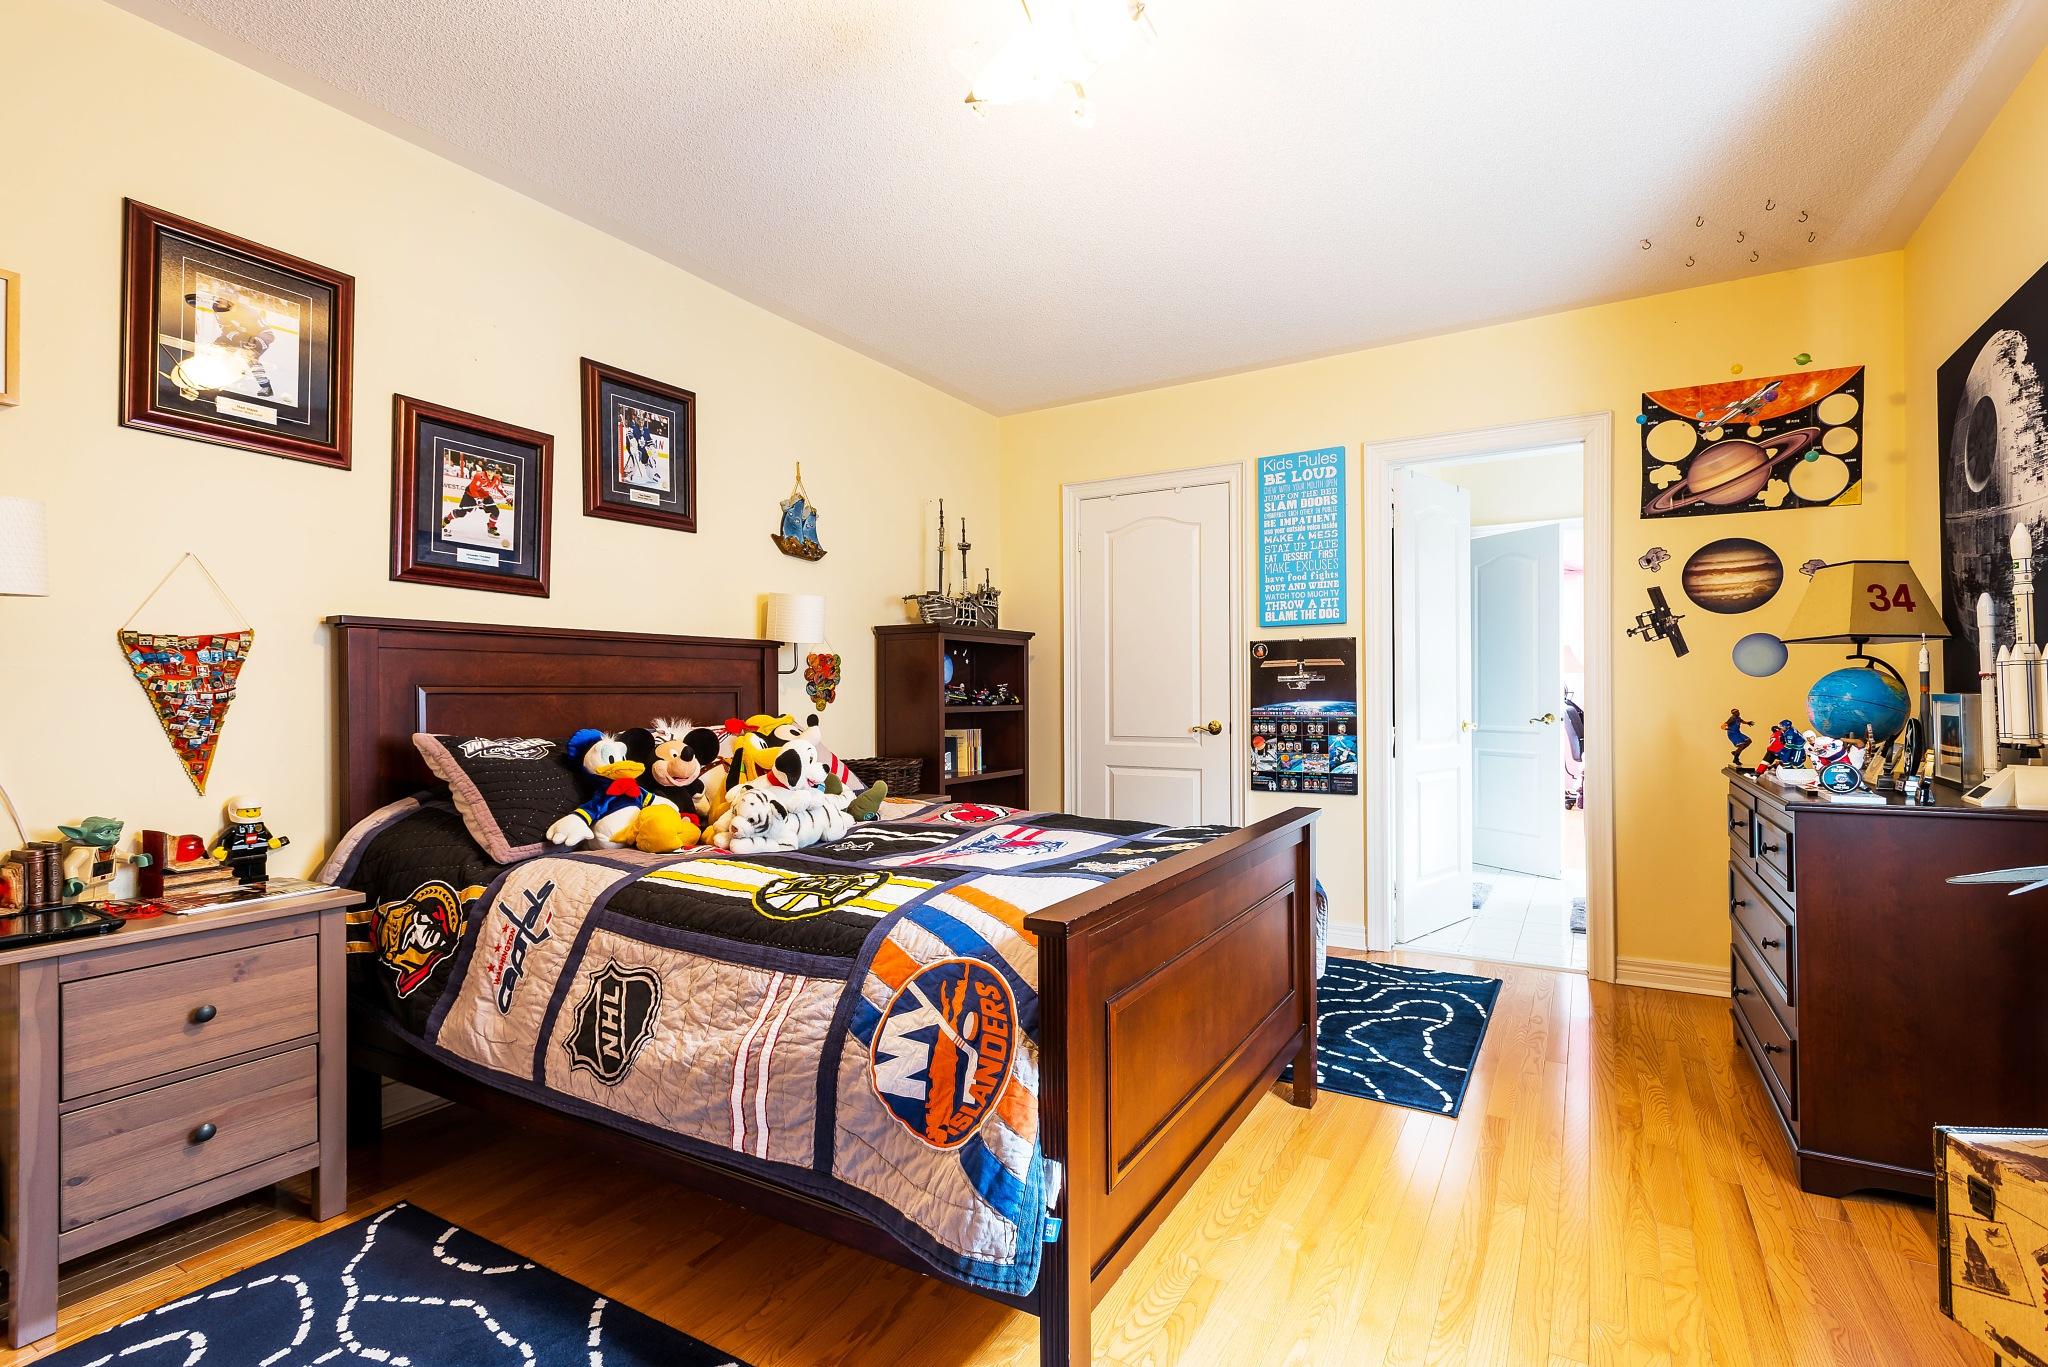 Boy's bedroom by Gareth Skipp